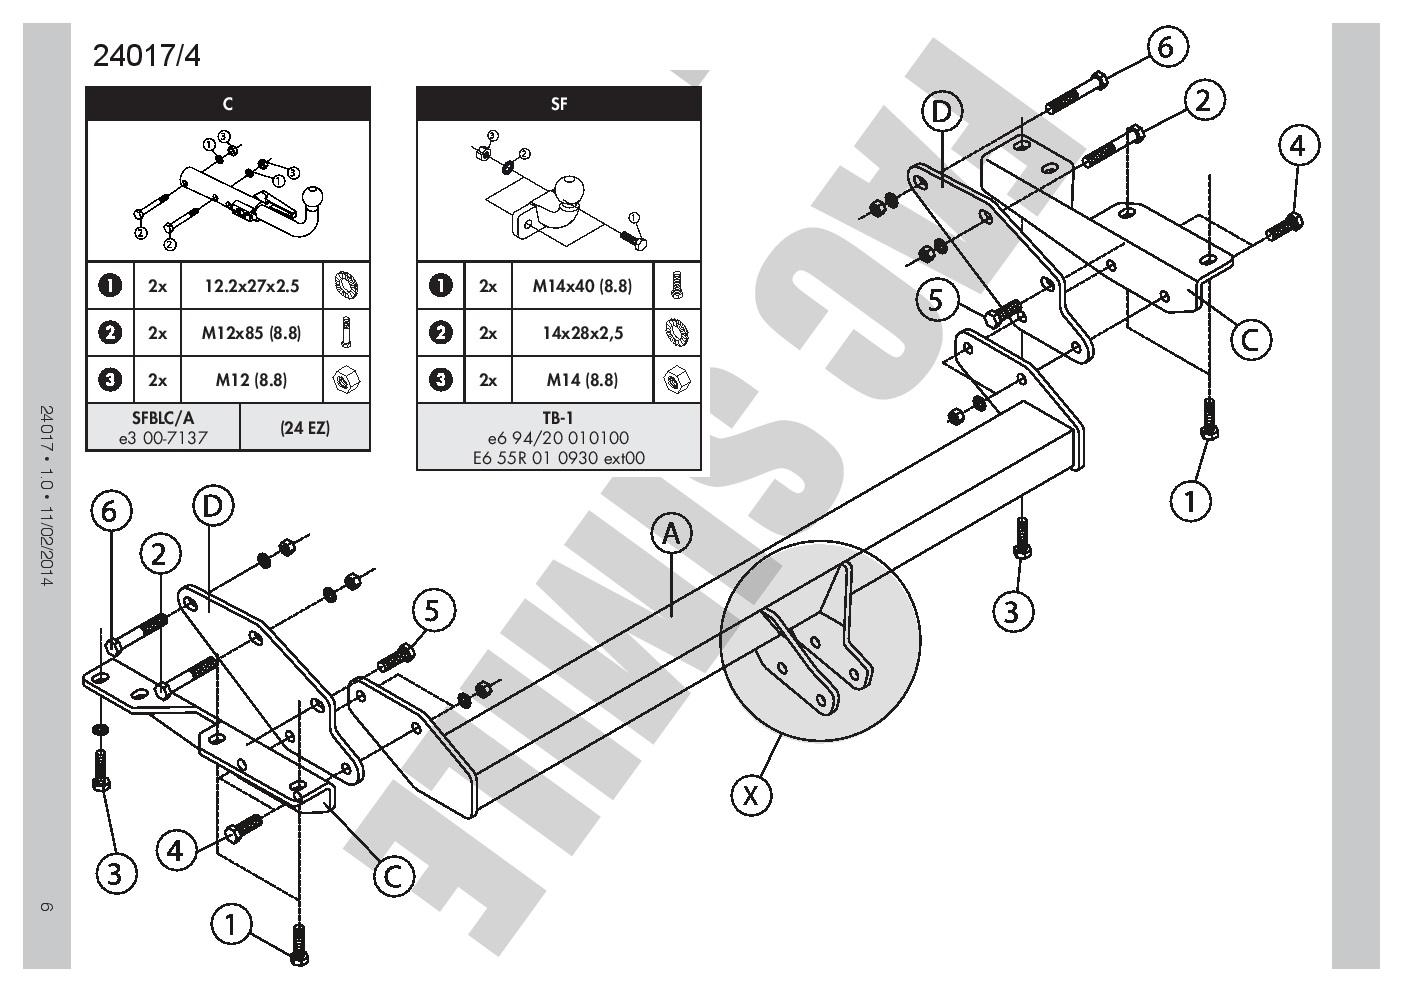 Towbar Disposal Ball And Hook 13p C2 Wiring For Mitsubishi Pajero 4d 2002 Montero Diagram